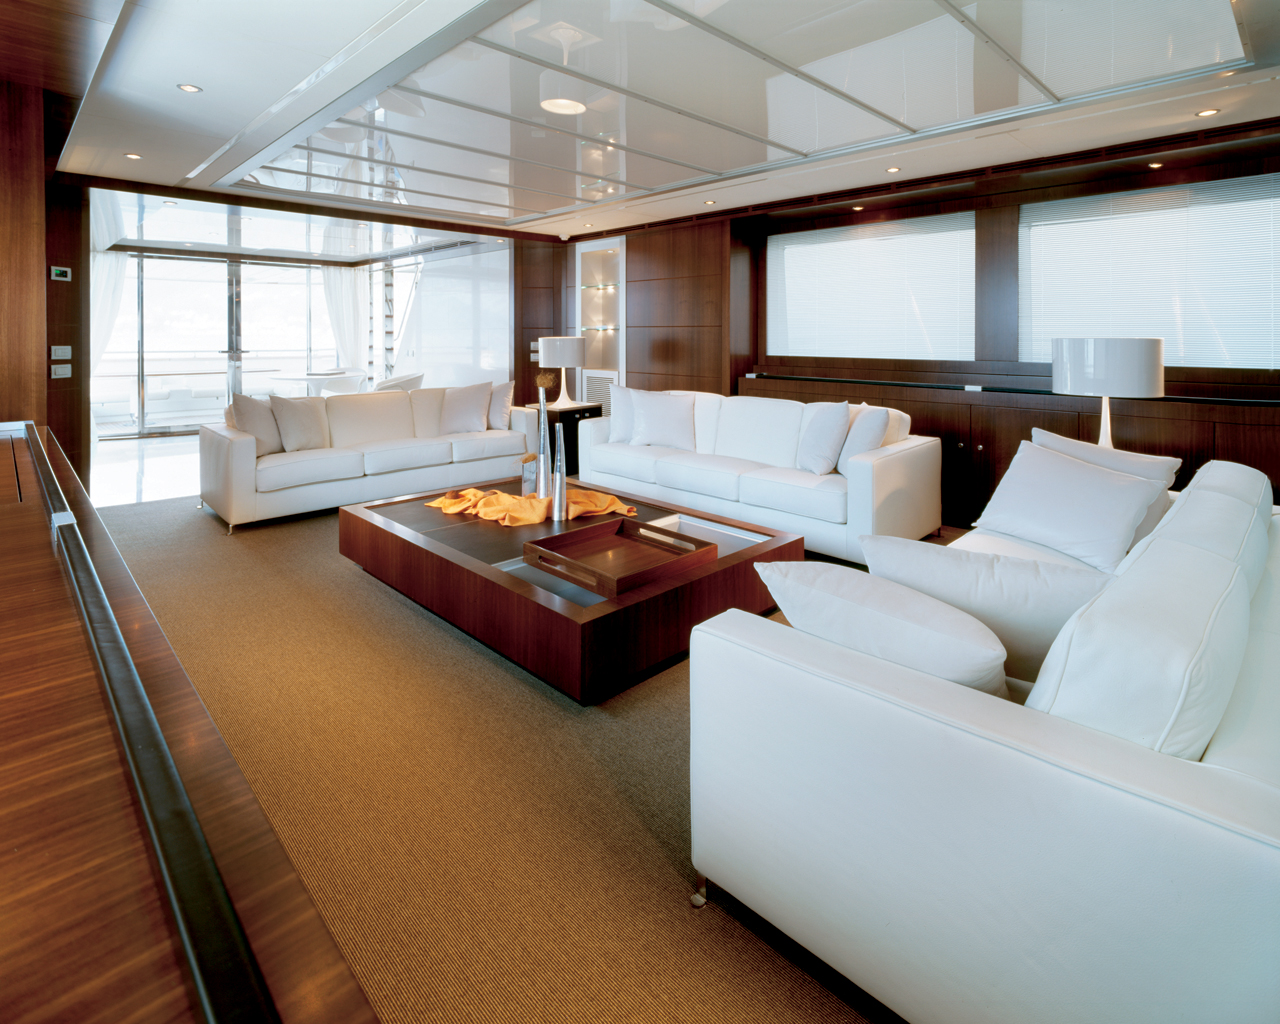 yacht-sitting-room-interior yacht sitting room interior